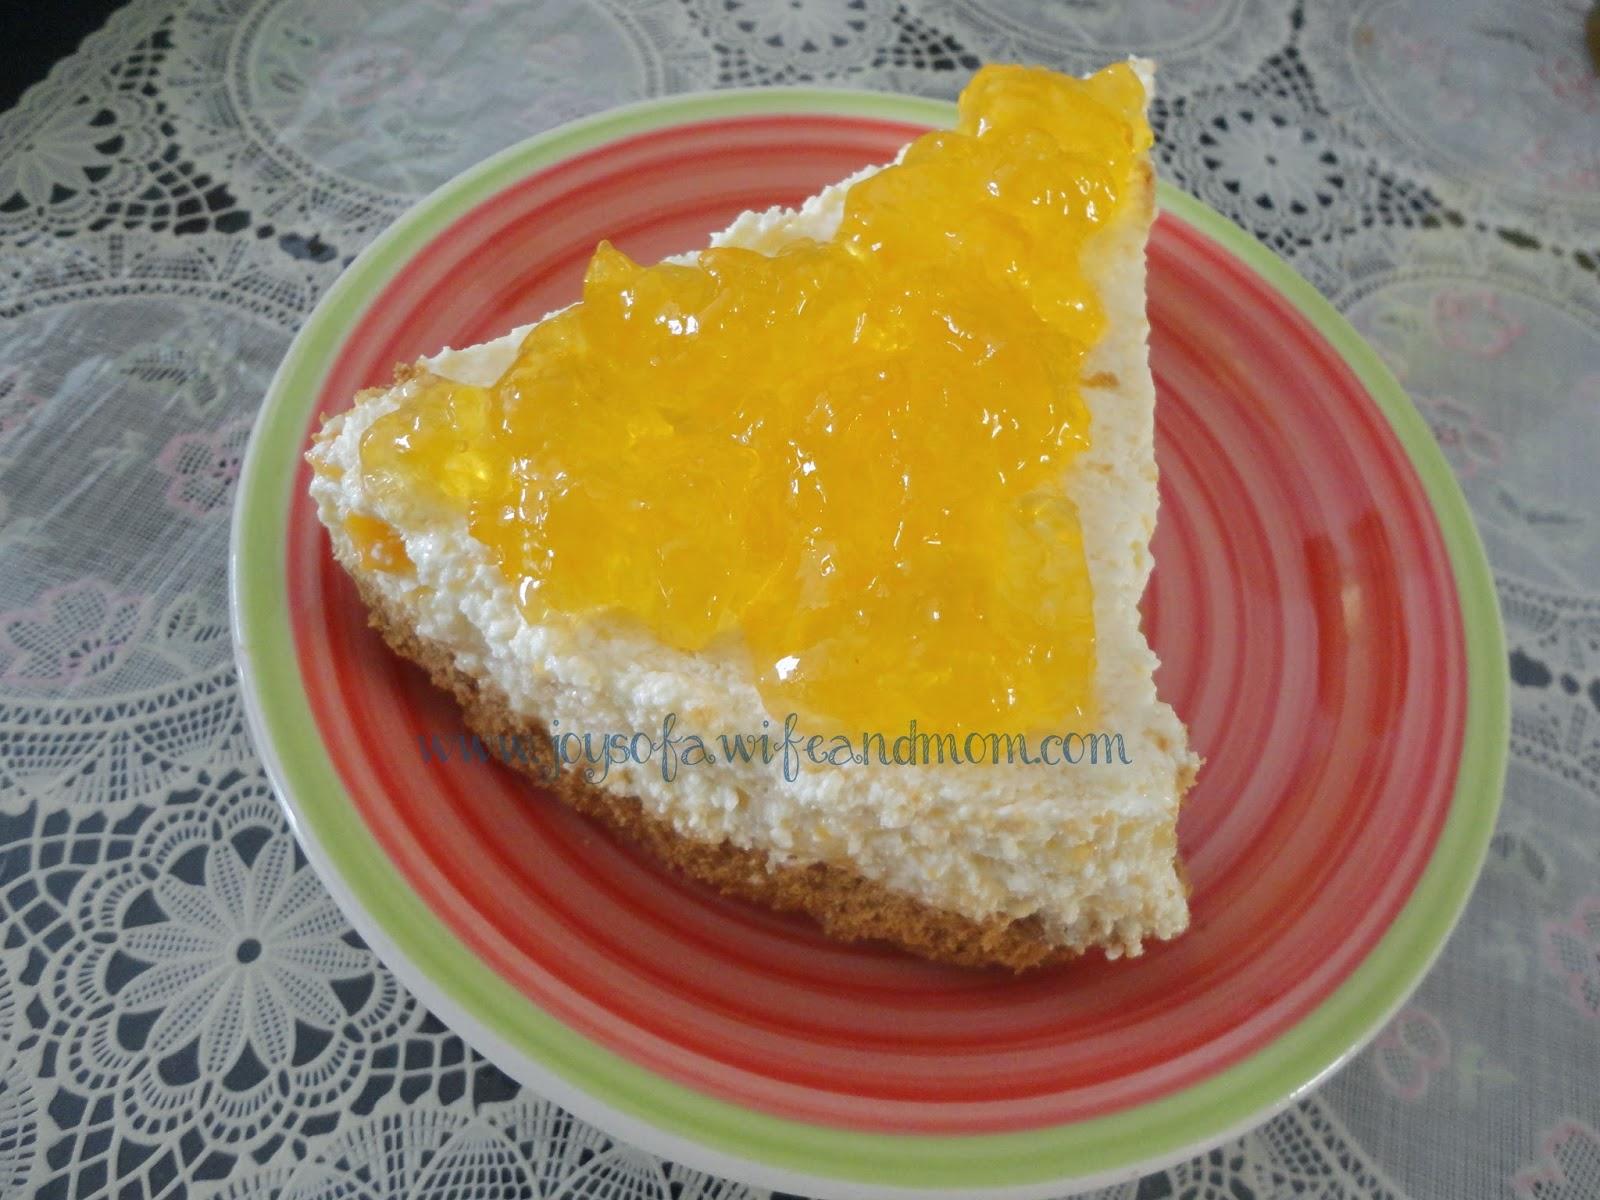 Home-made No Bake Mango Cheesecake